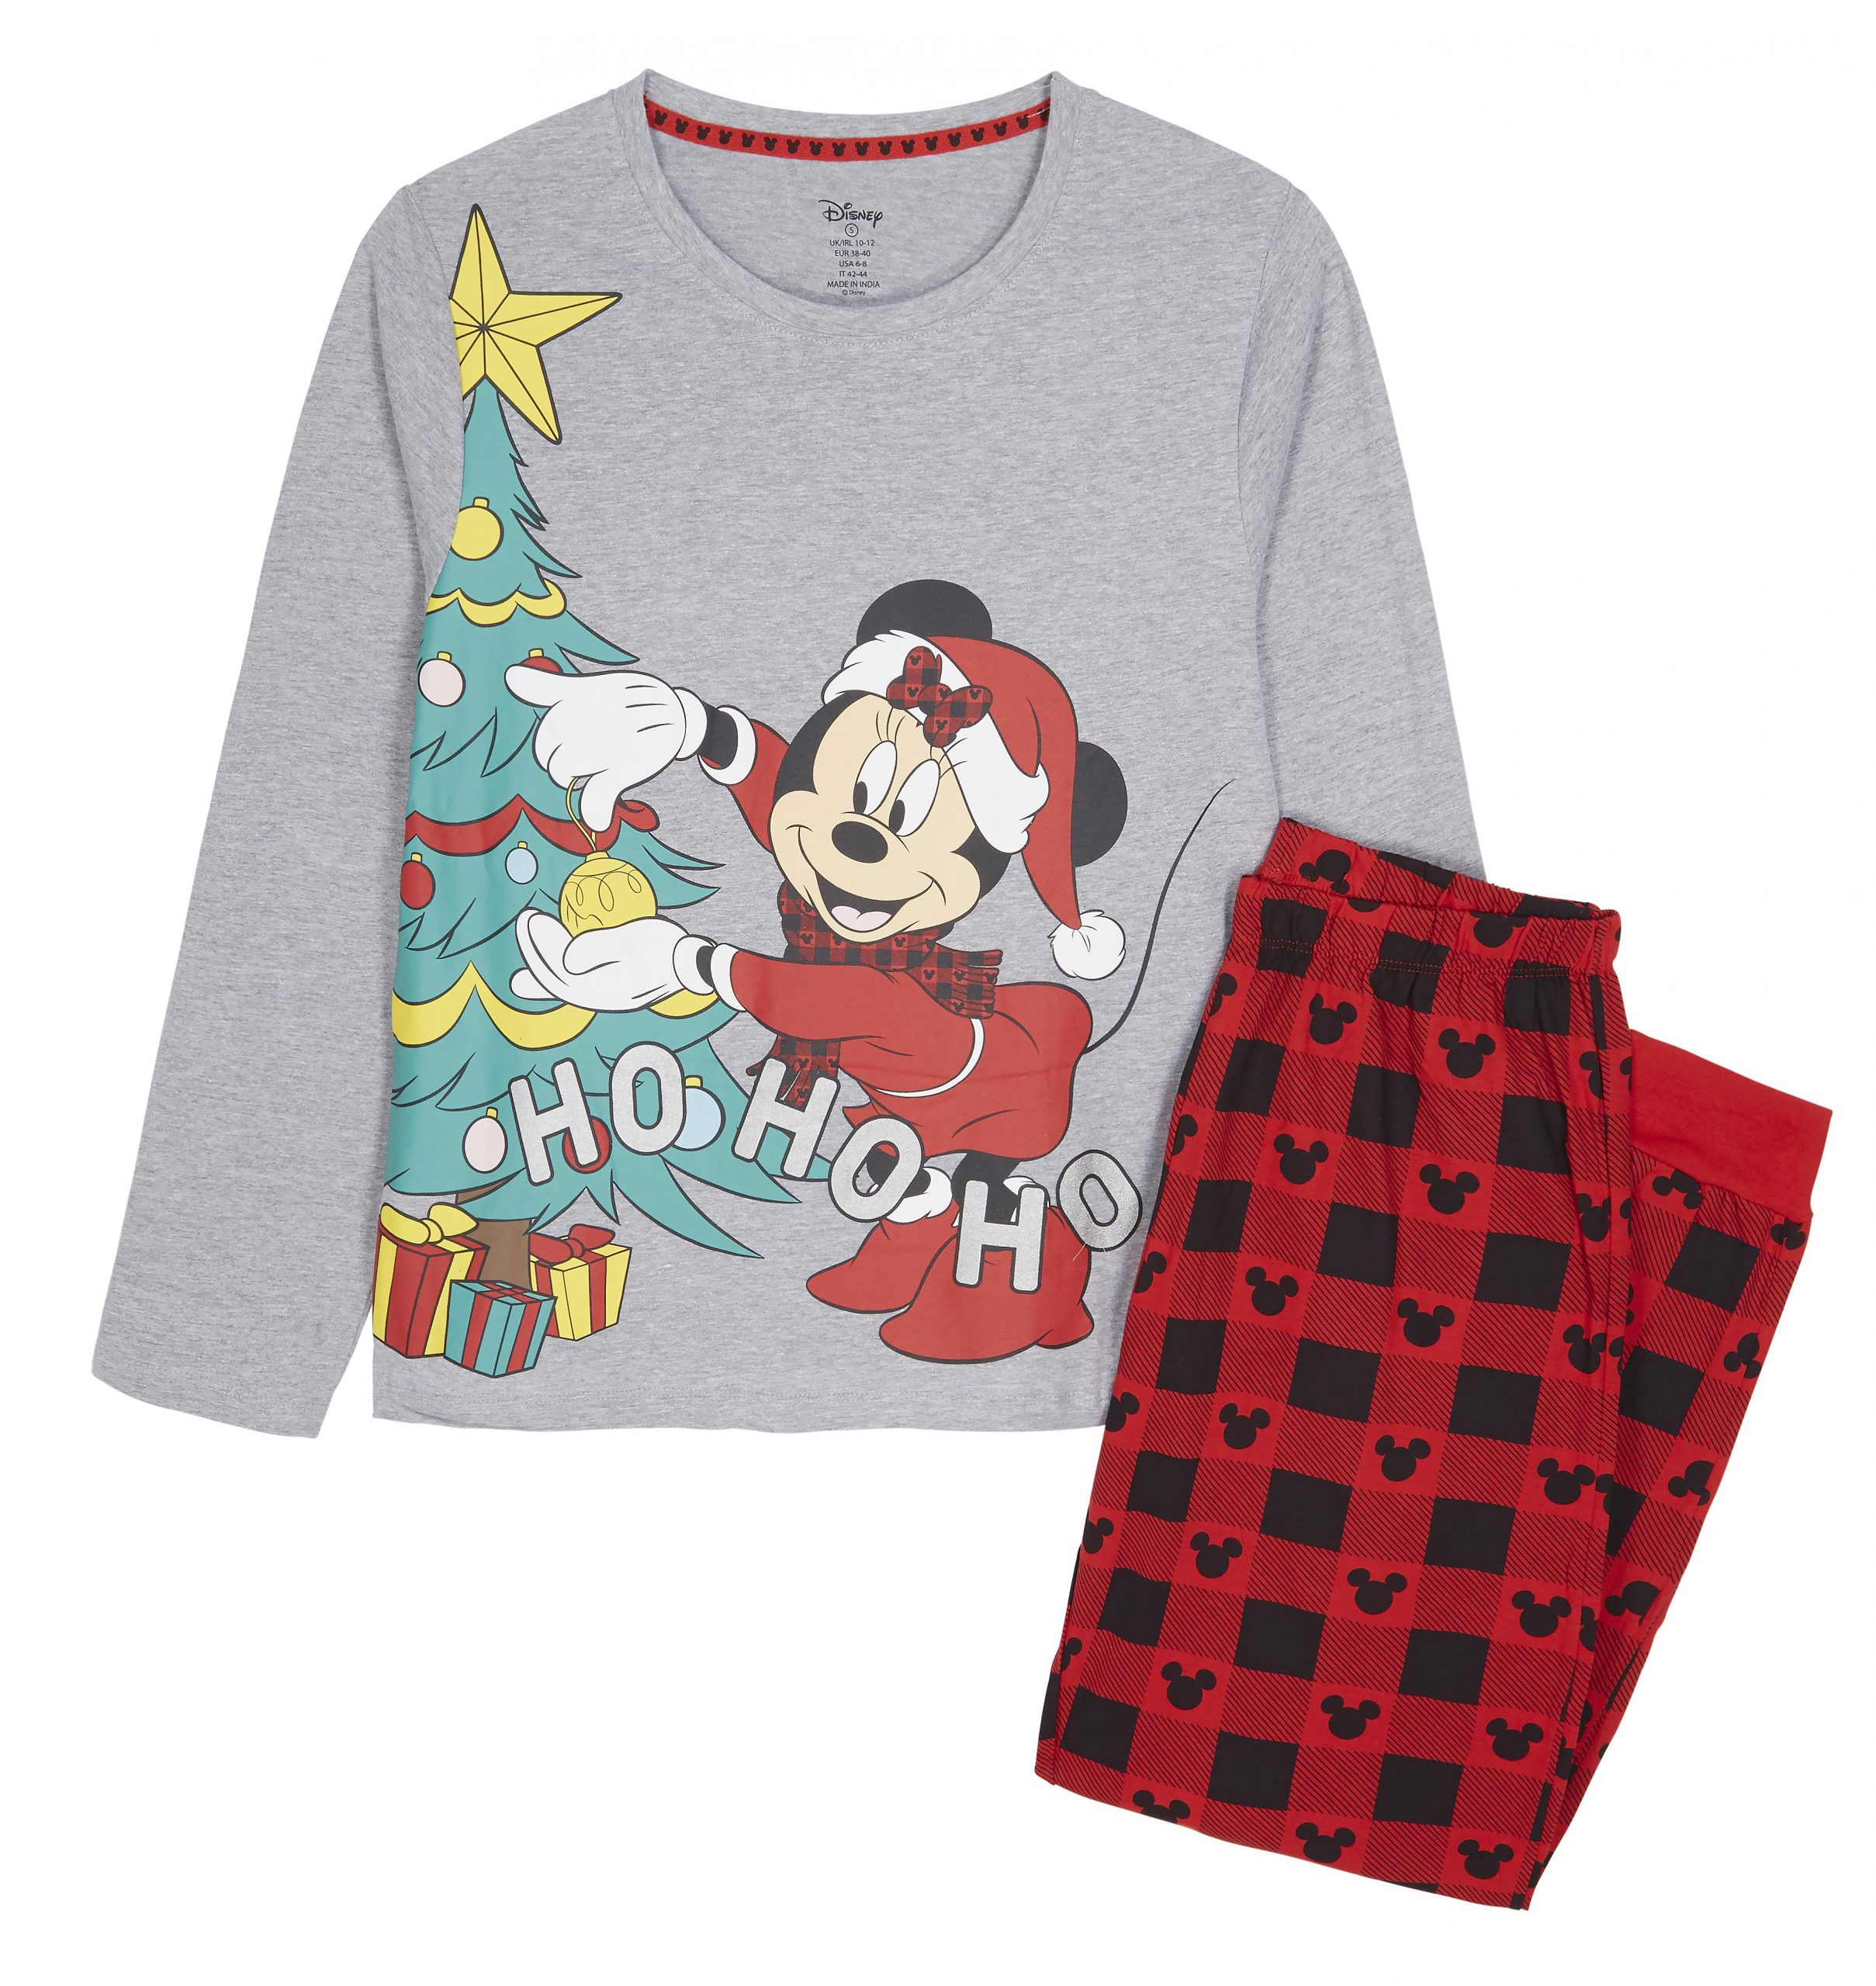 Pijamas familiares a juego